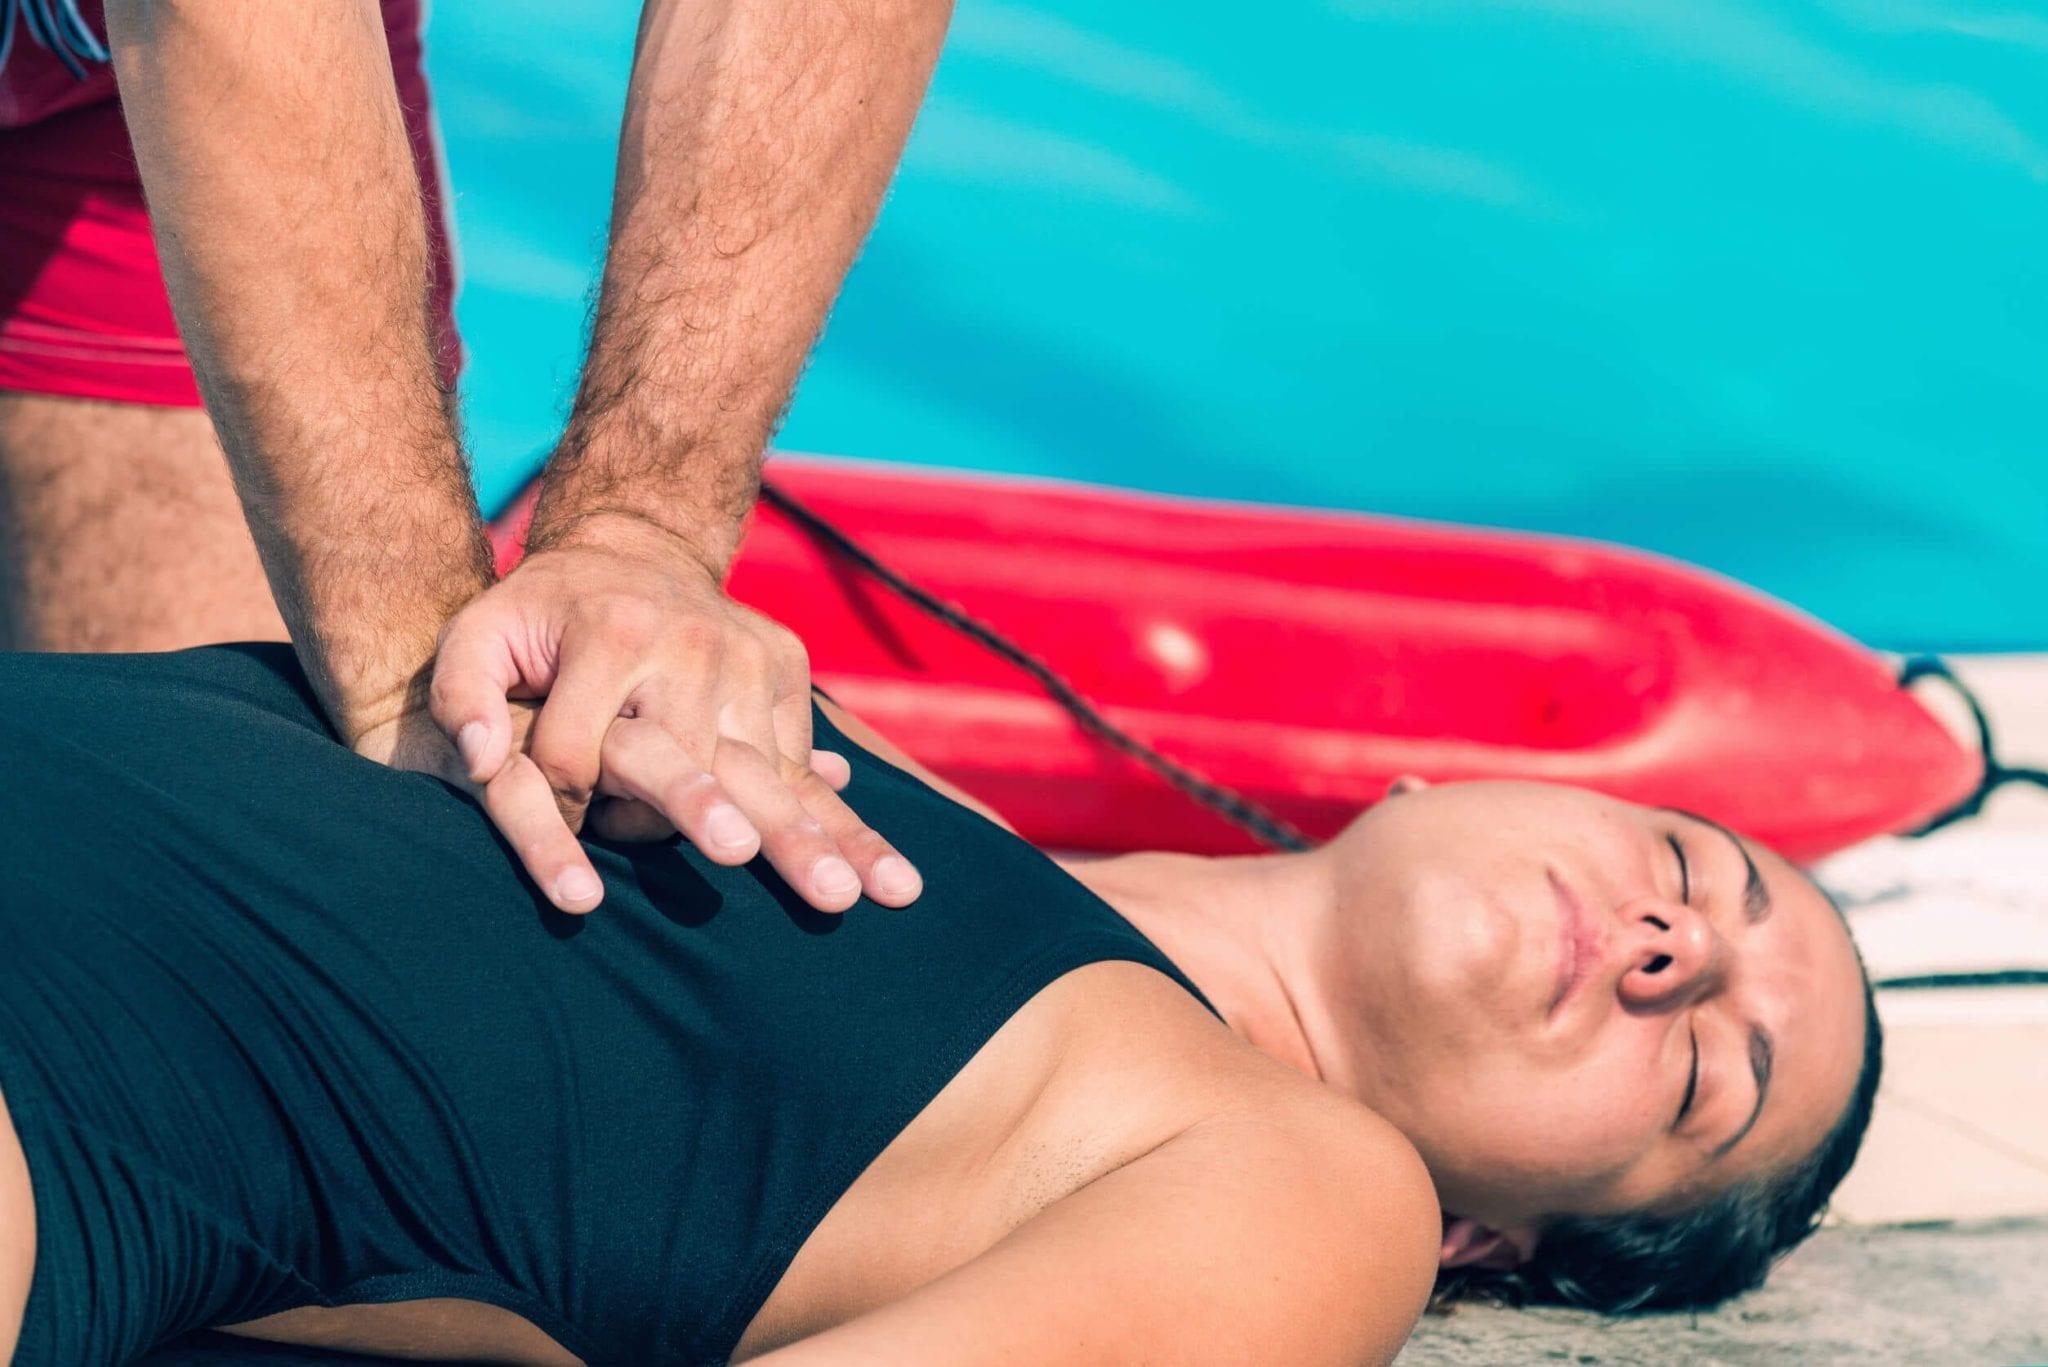 Texas Swimming Pool Injury Prevention